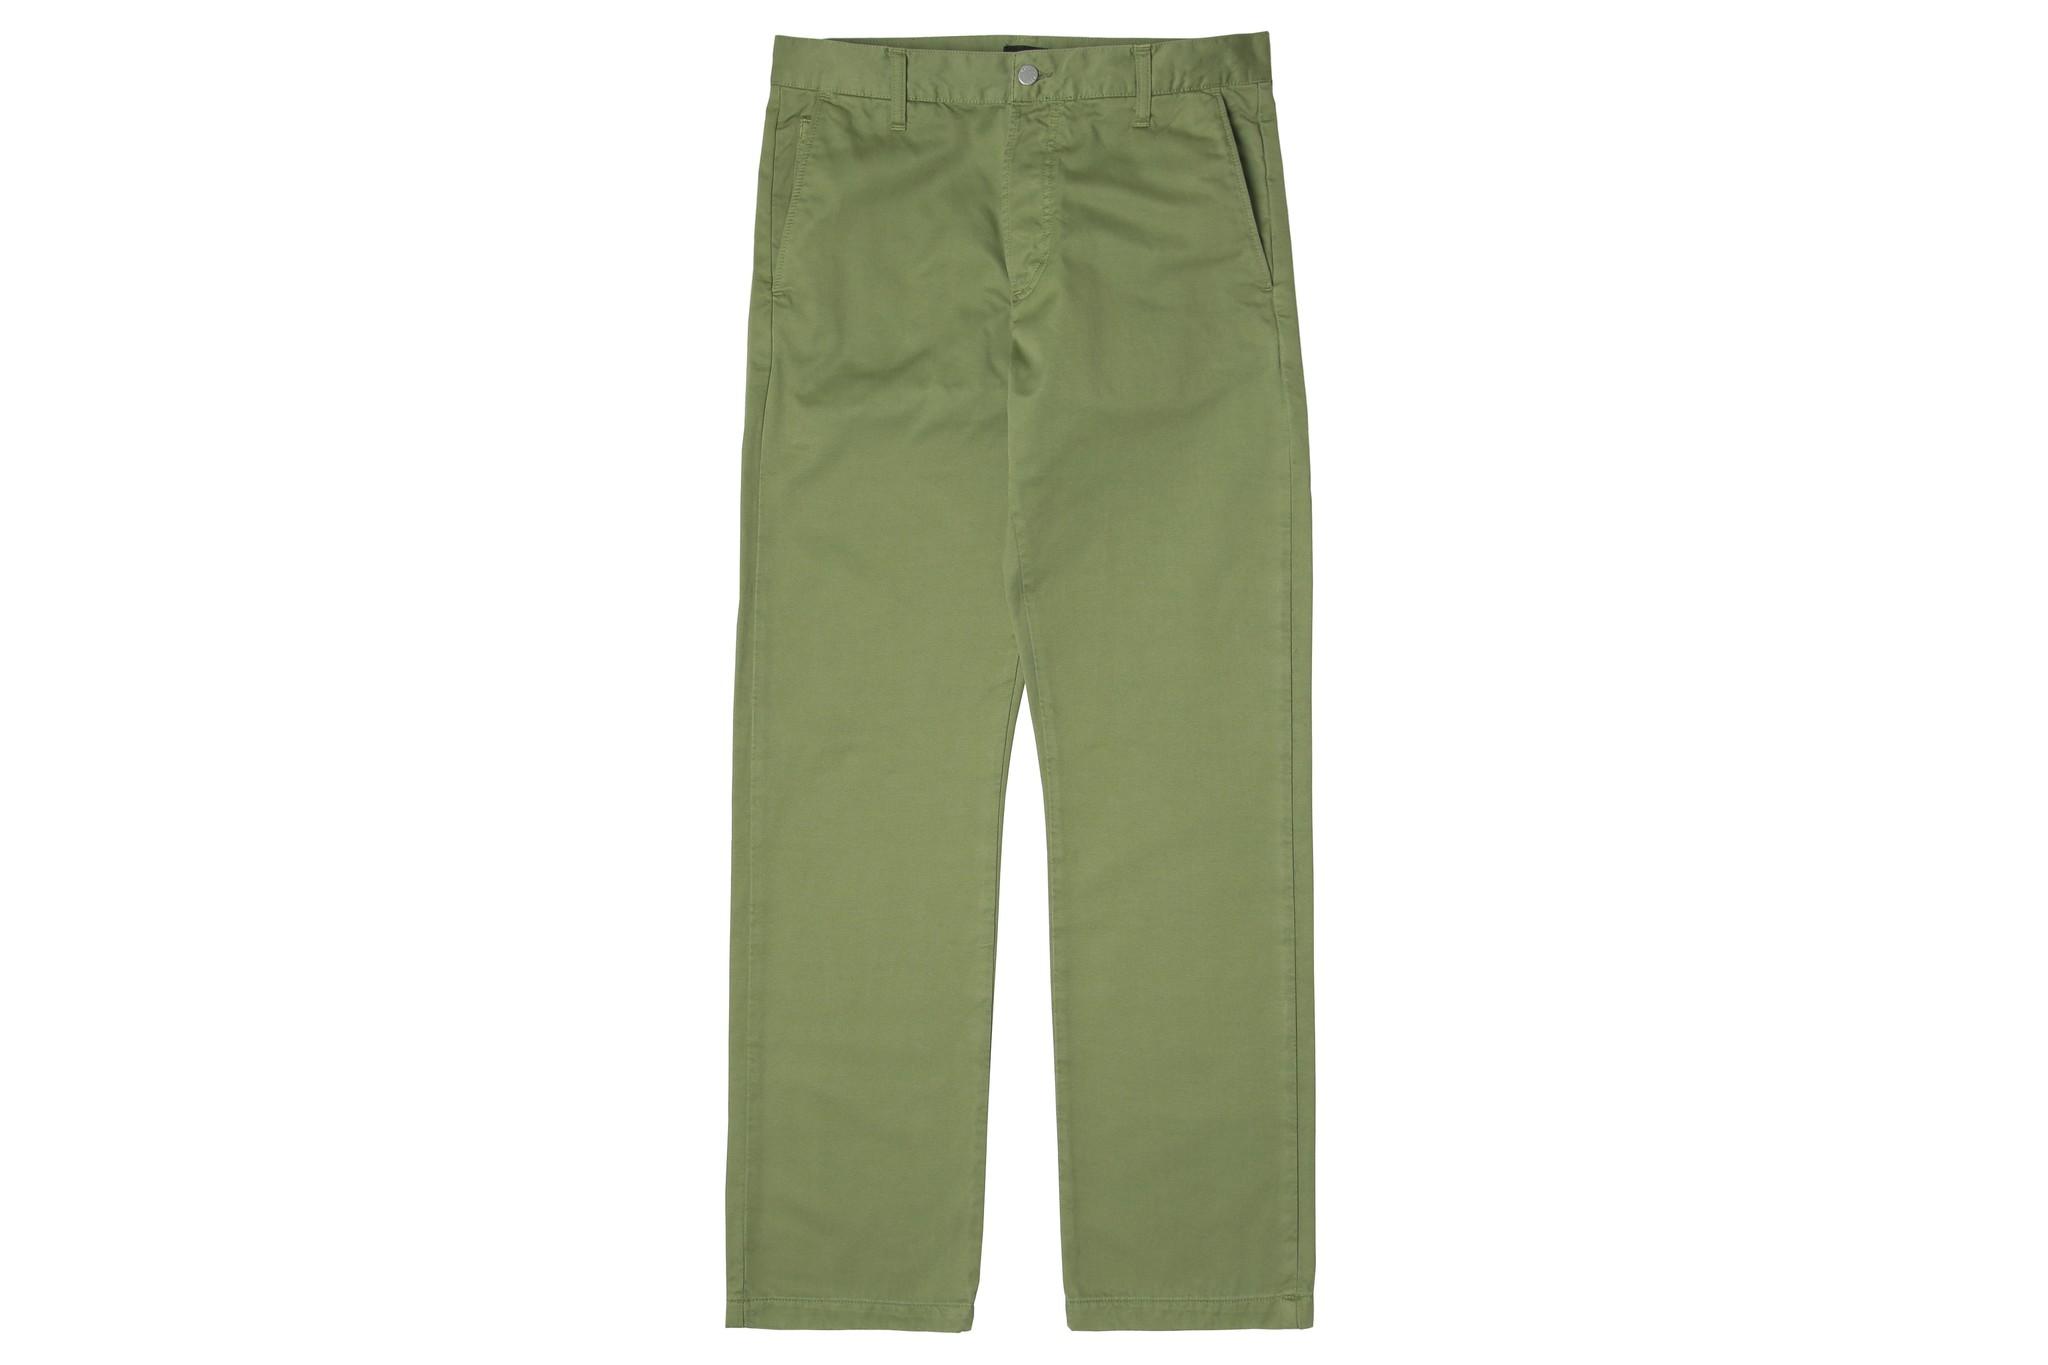 39 Chino PFD Olive Green Compact 9oz Twill-1